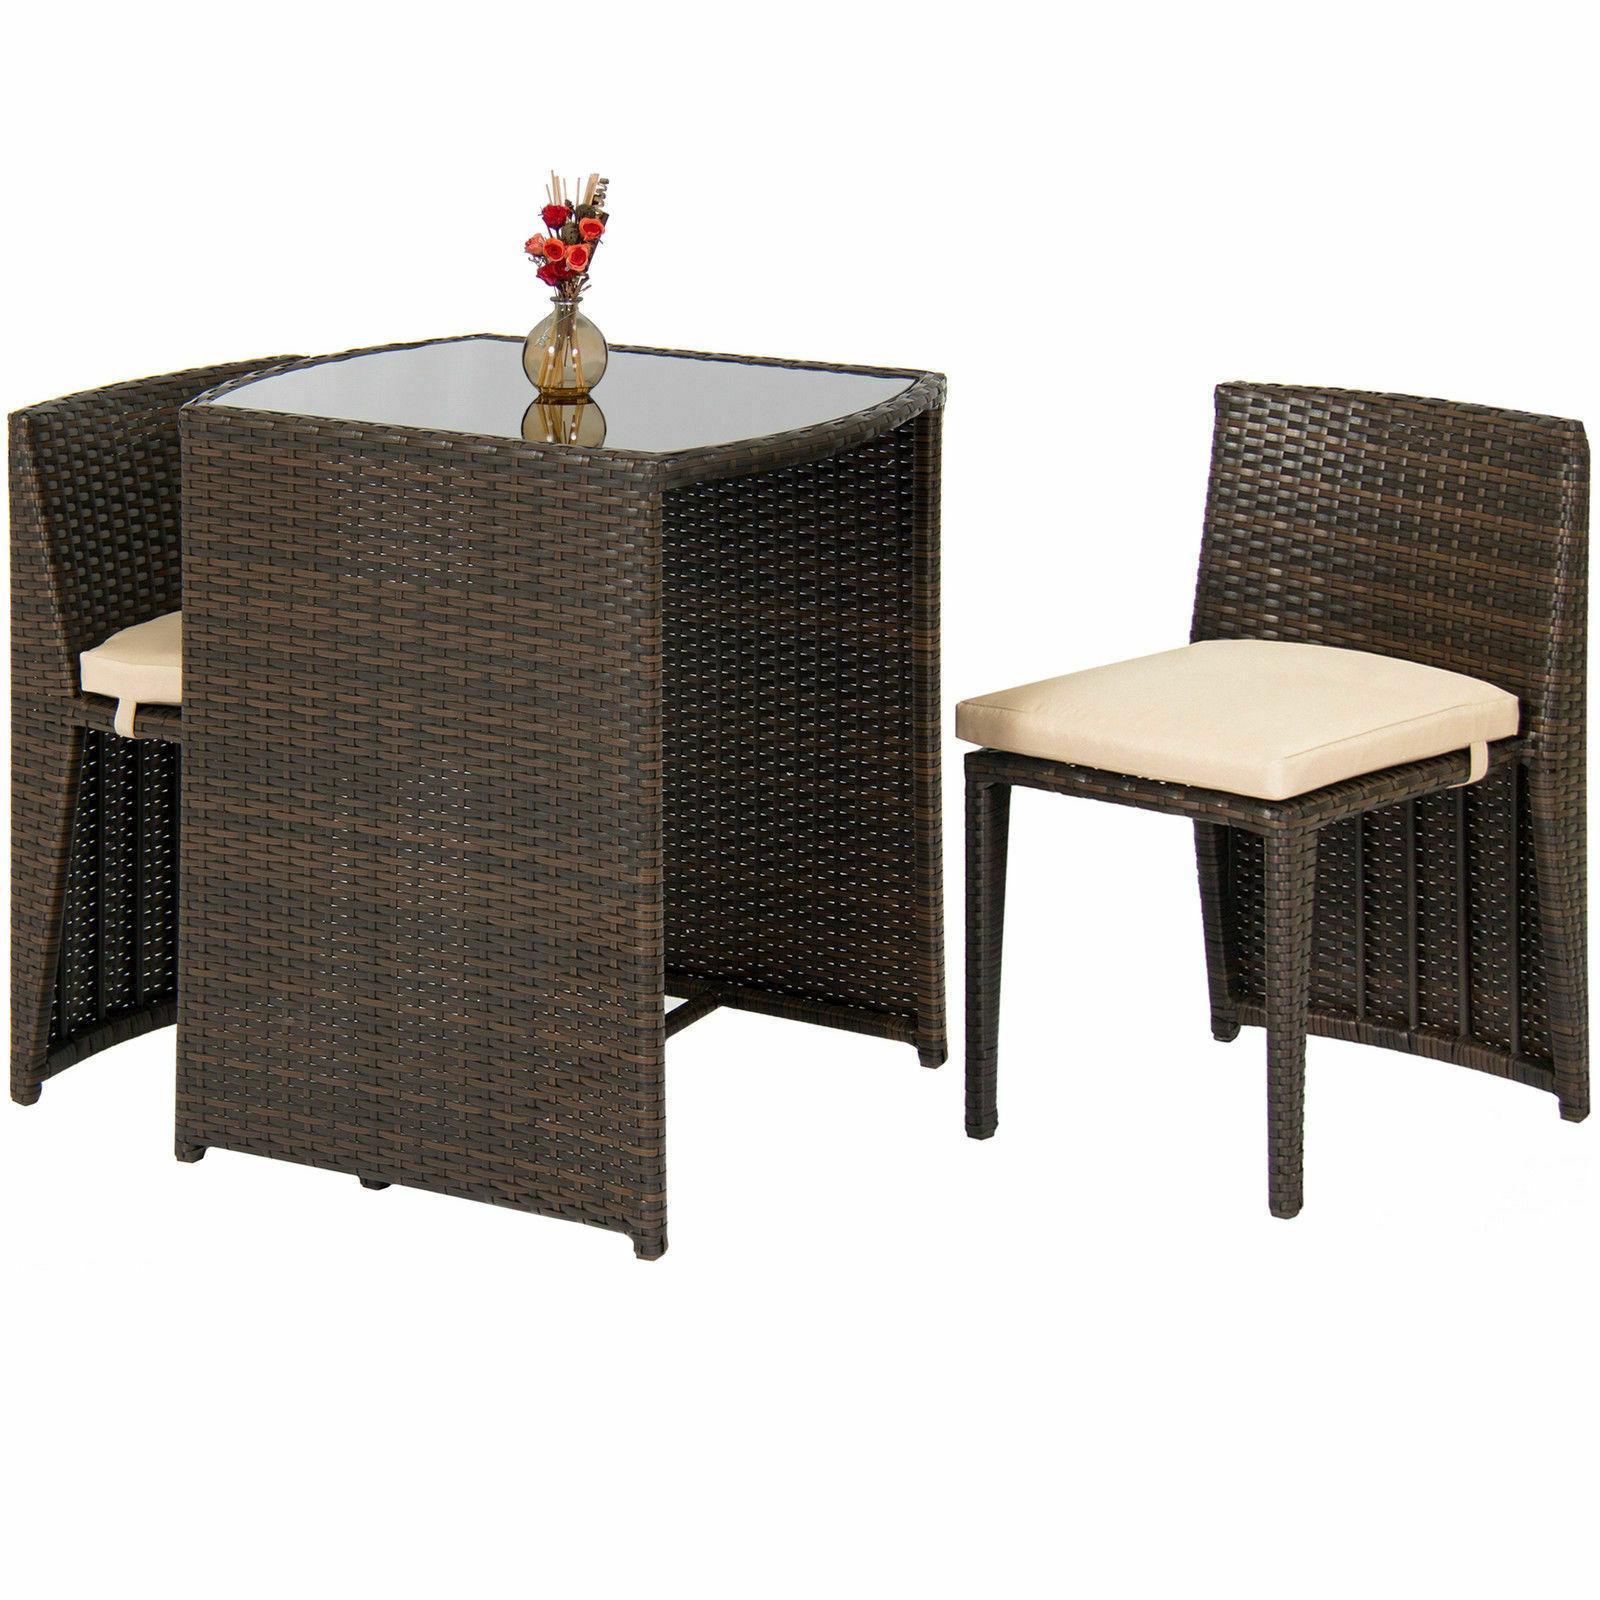 Outdoor Patio Furniture Wicker 3pc Top 2 Brown